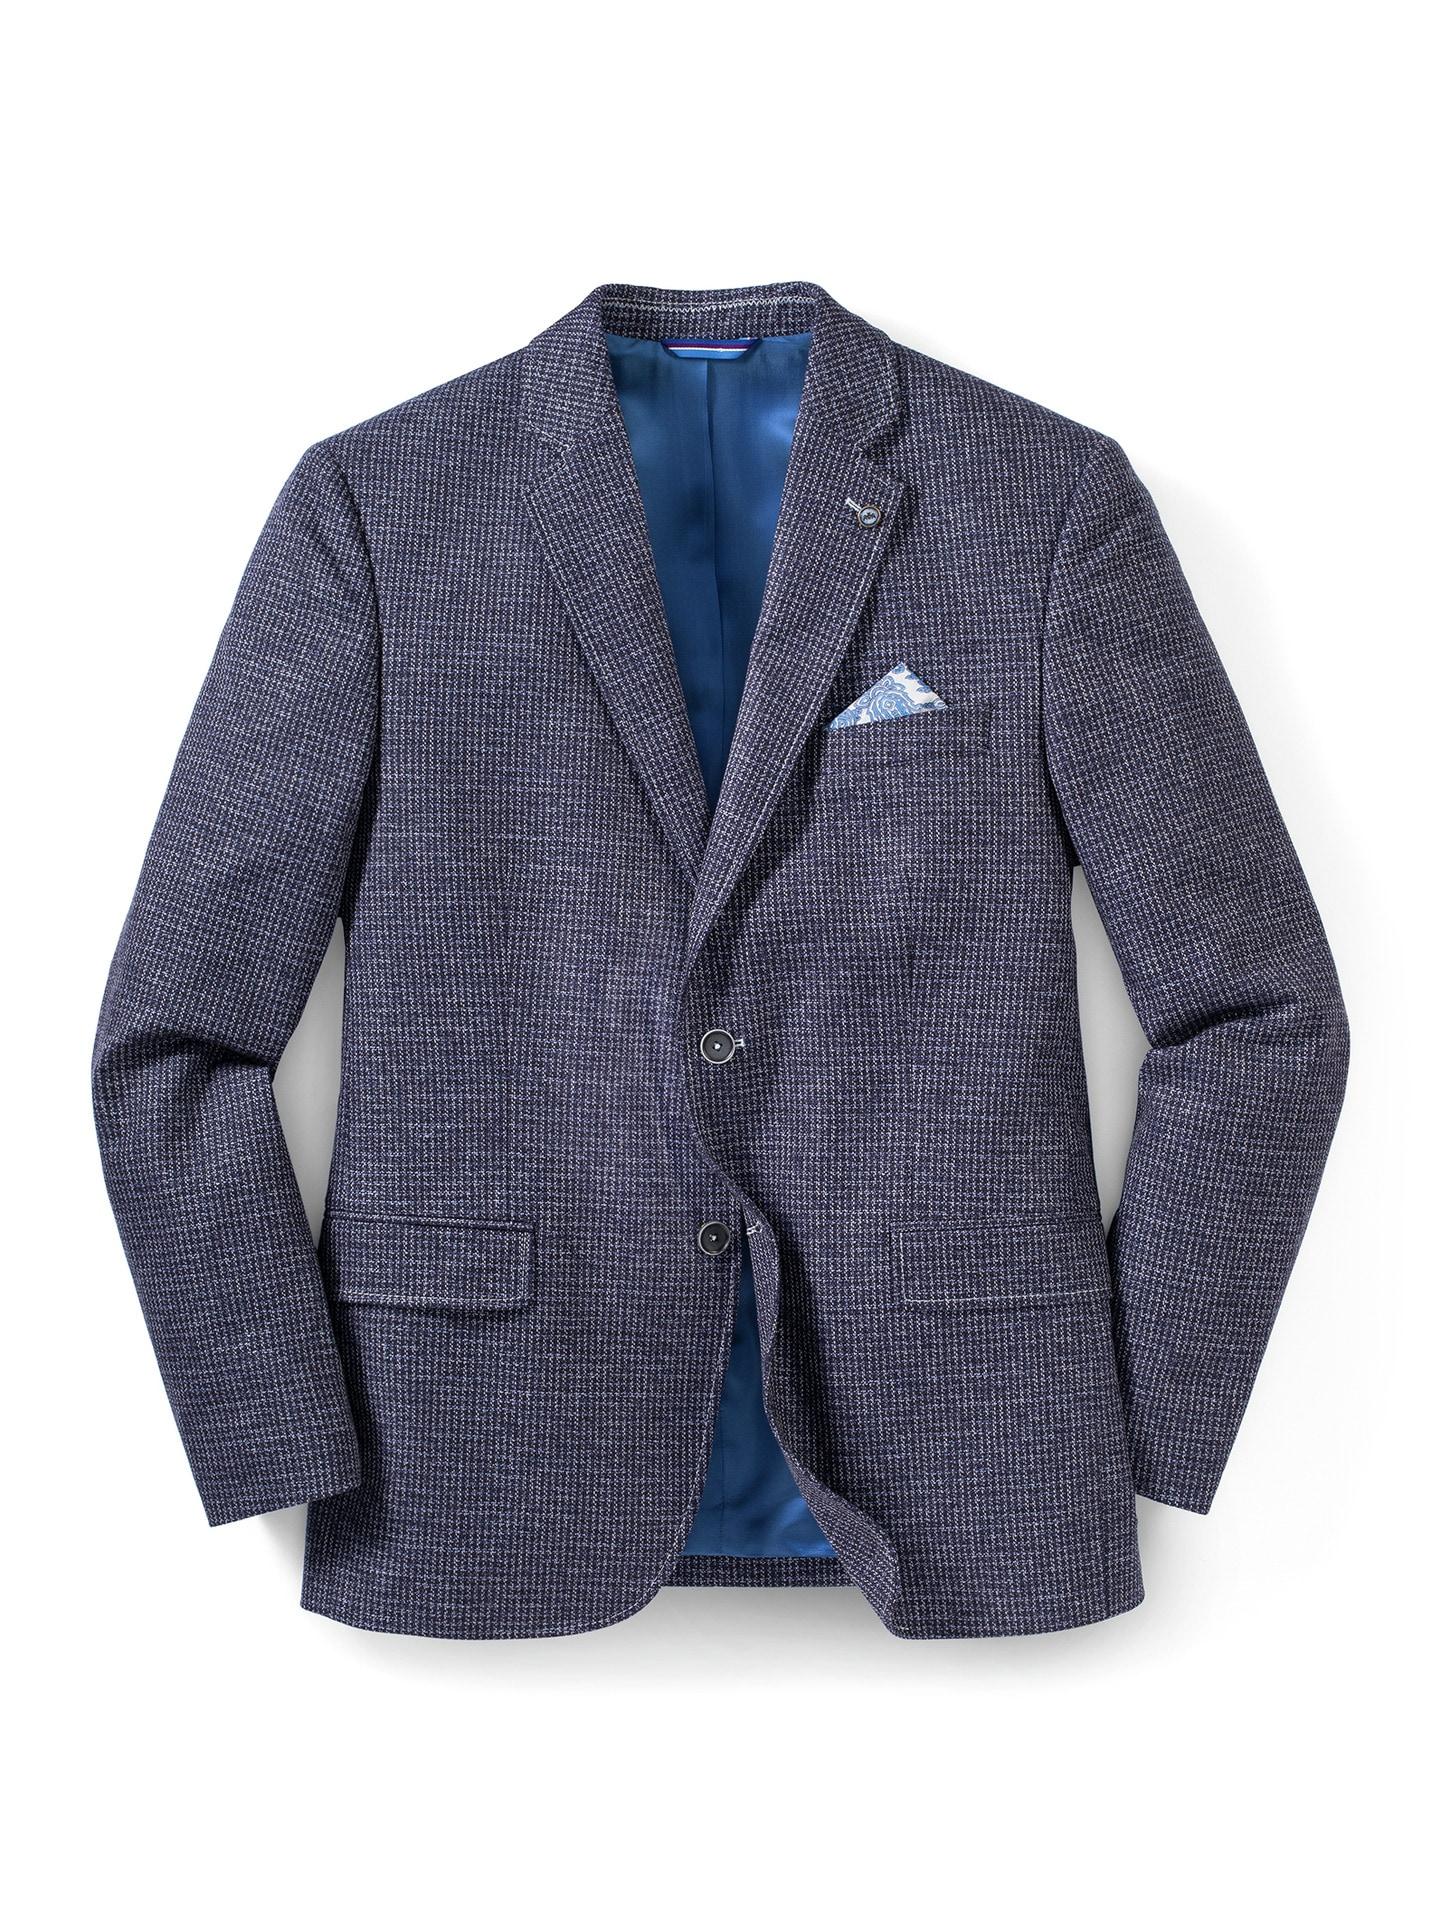 Walbusch Herren Semi Dress Sakko gemustert Blau Gemustert 24, 25, 26, 27, 28, 29, 48, 50, 52, 54, 56, 58 24-3426-5